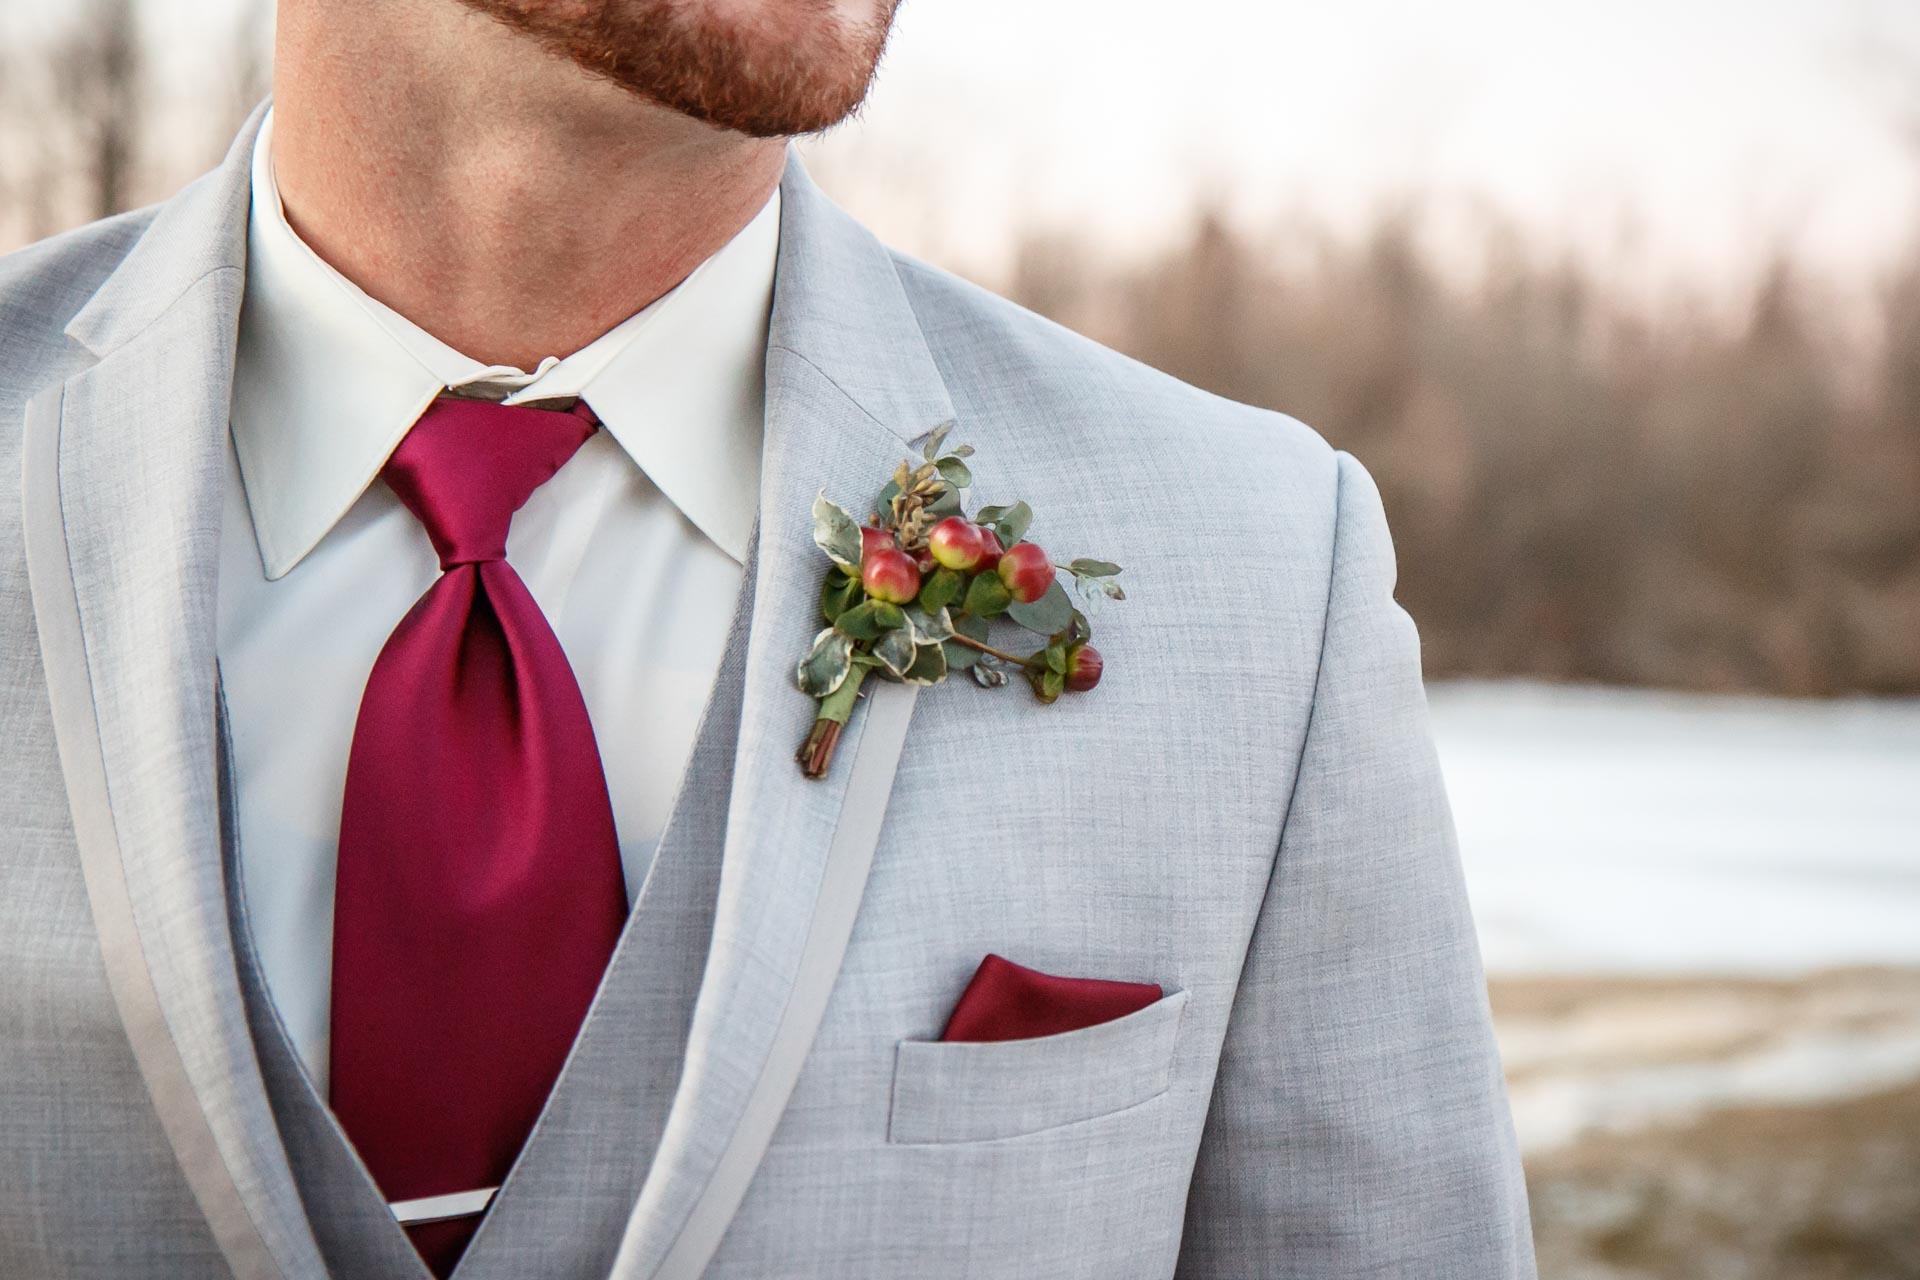 wedding-adam-shea-photography-green-bay-appleton-neenah-photographer-19.jpg